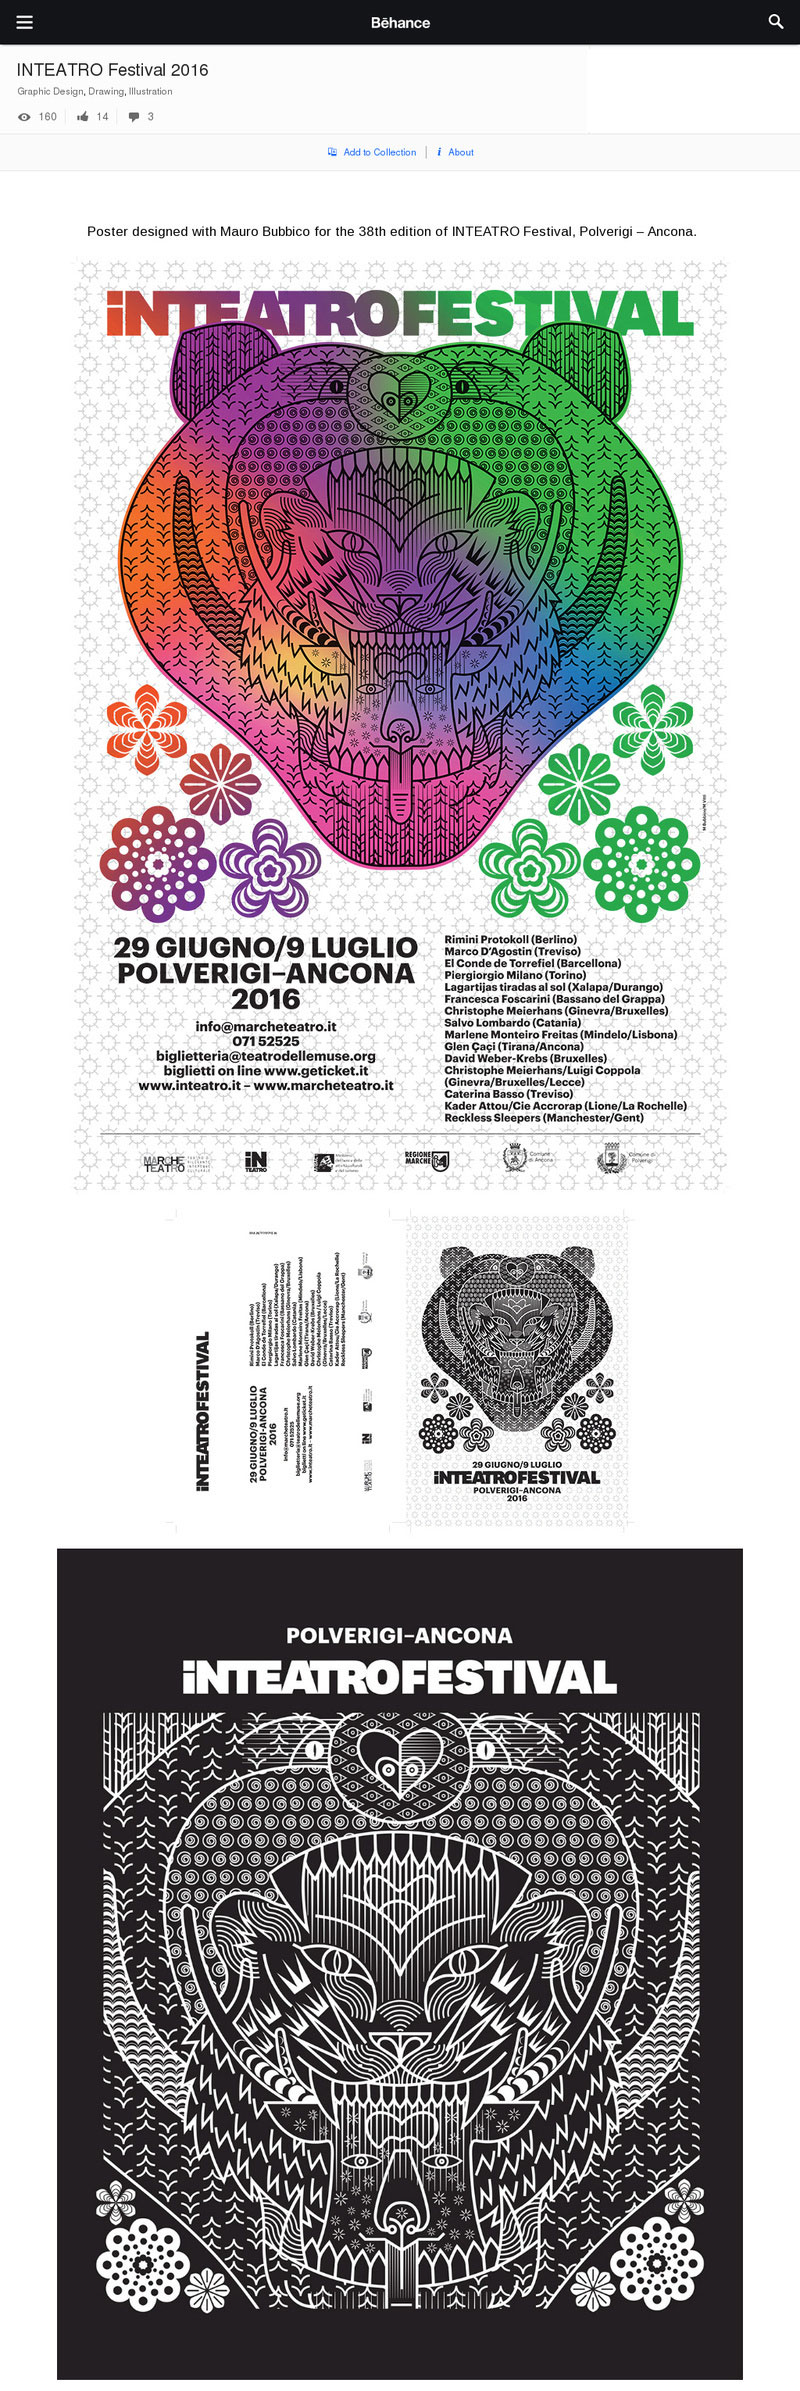 www.behance.INTEATRO-Festival-2016